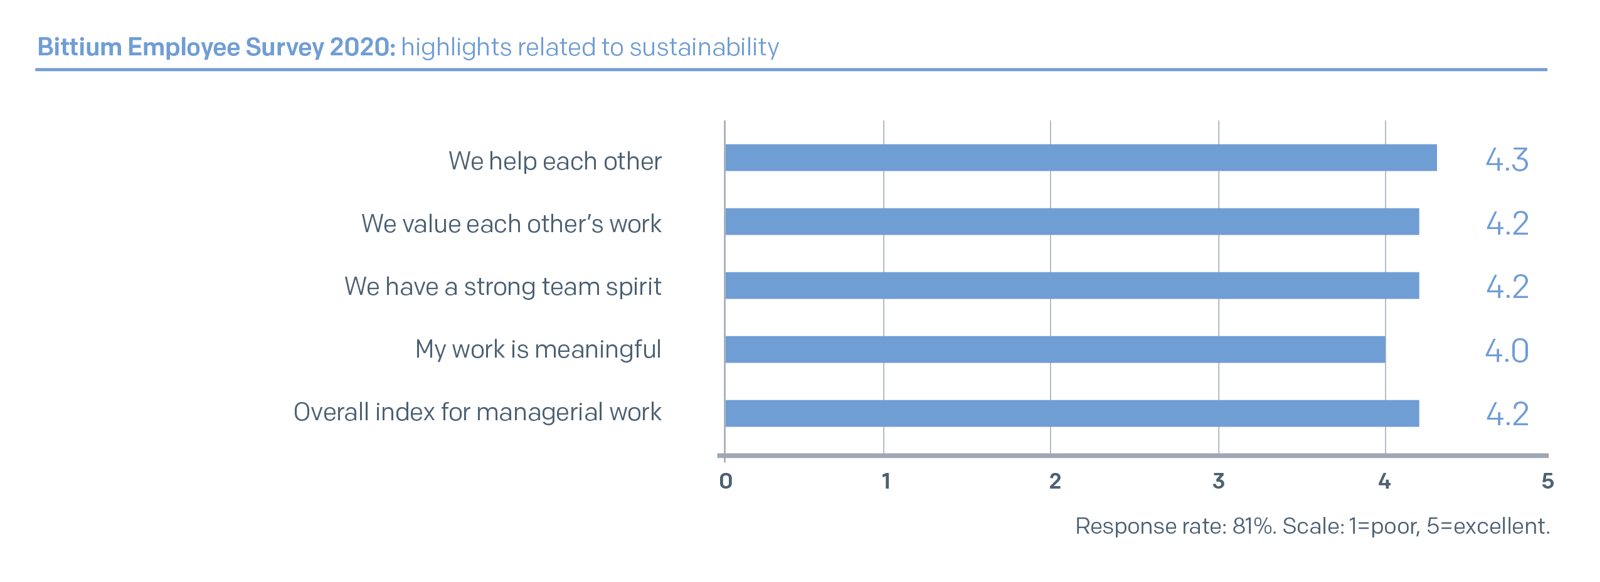 Bittium Employee Survey 2020: highlights related to sustainability